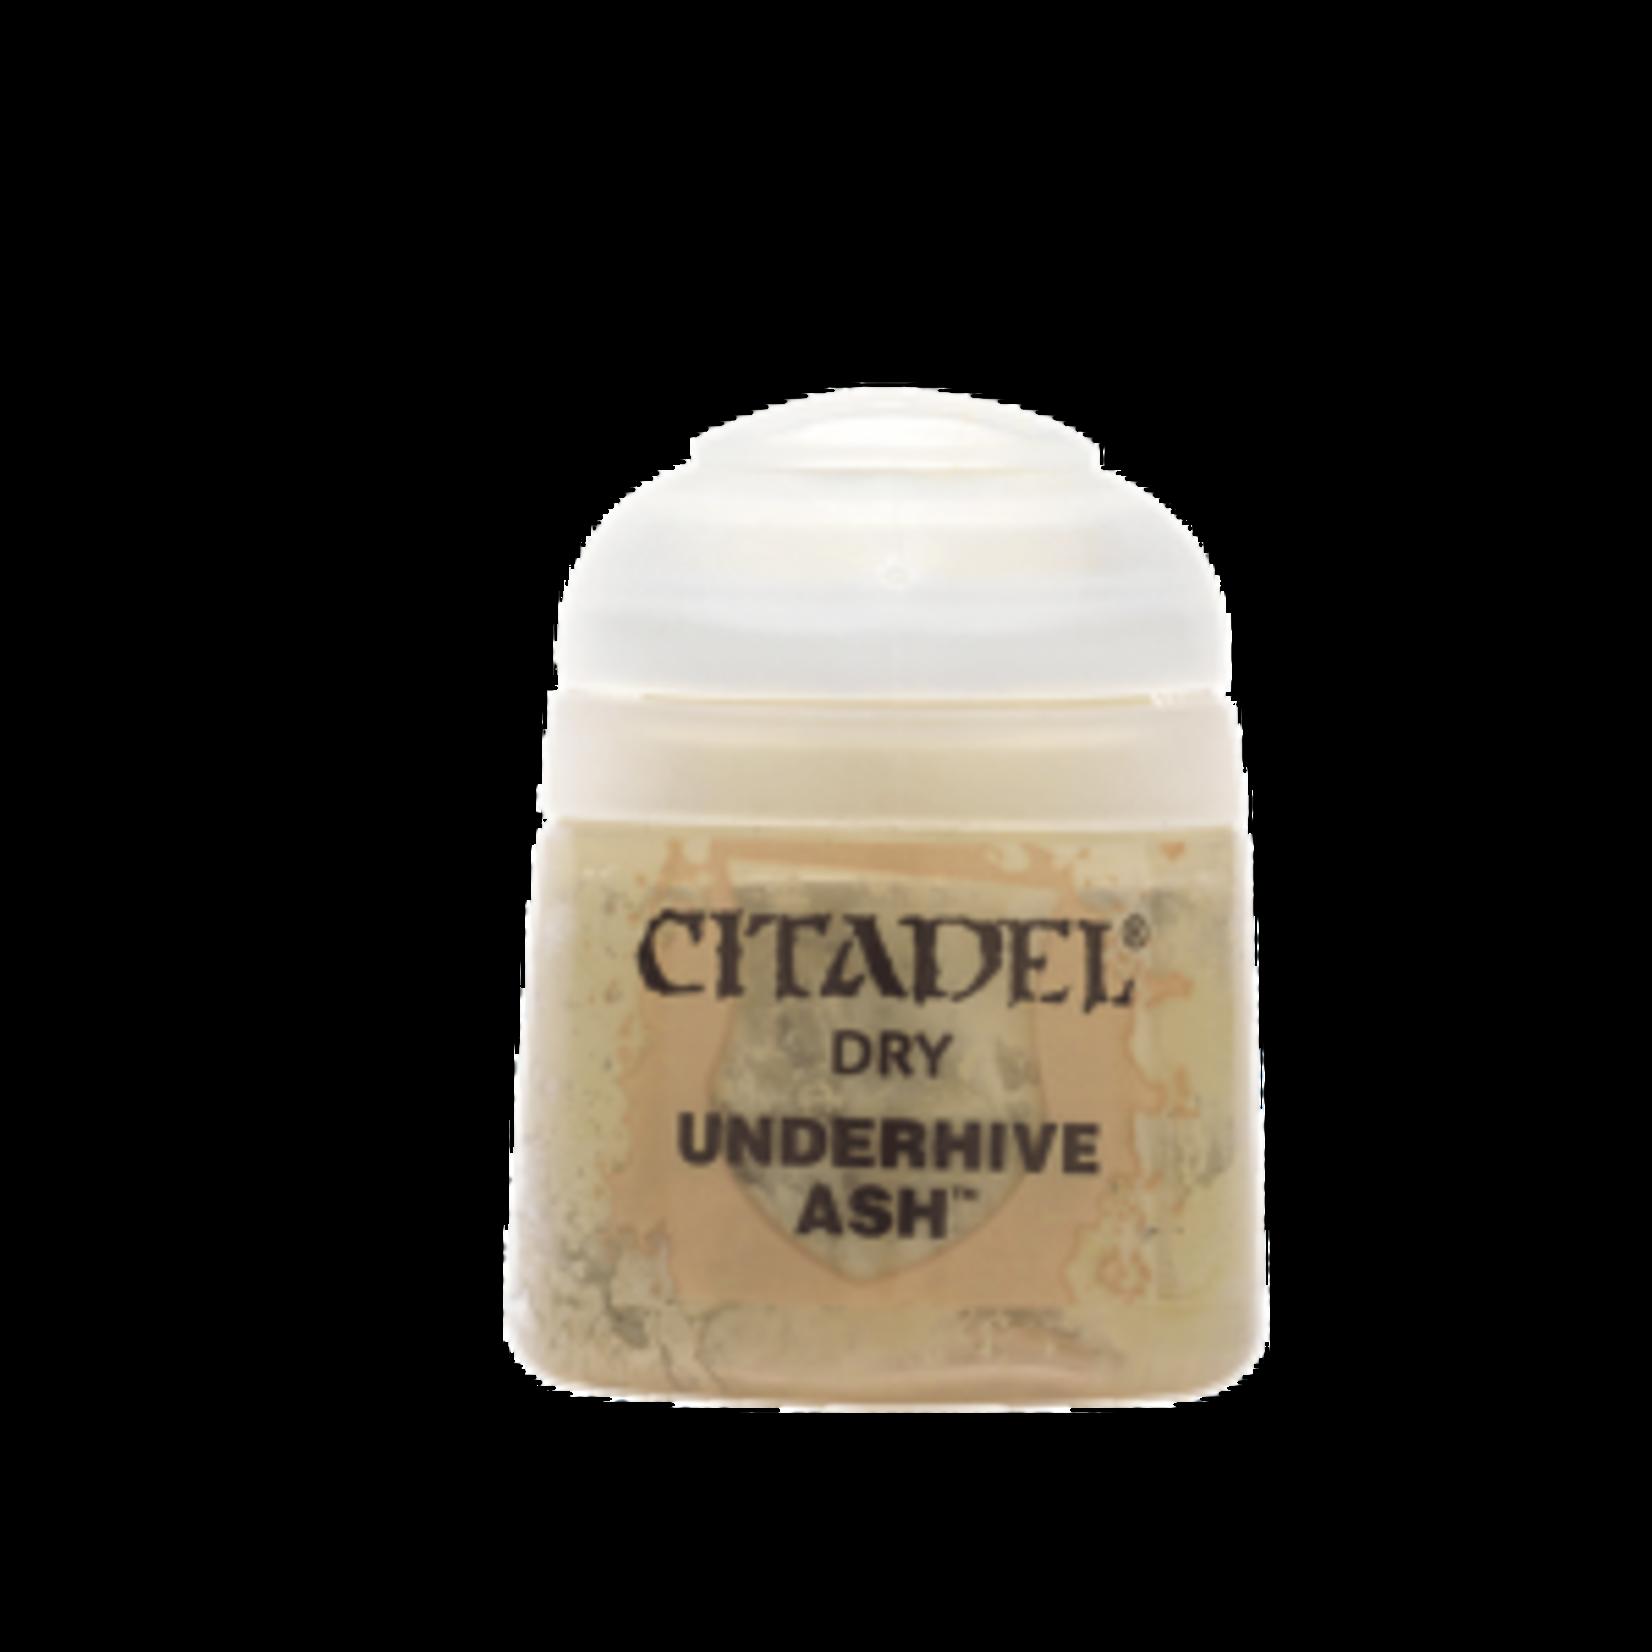 Citadel Dry Underhive Ash